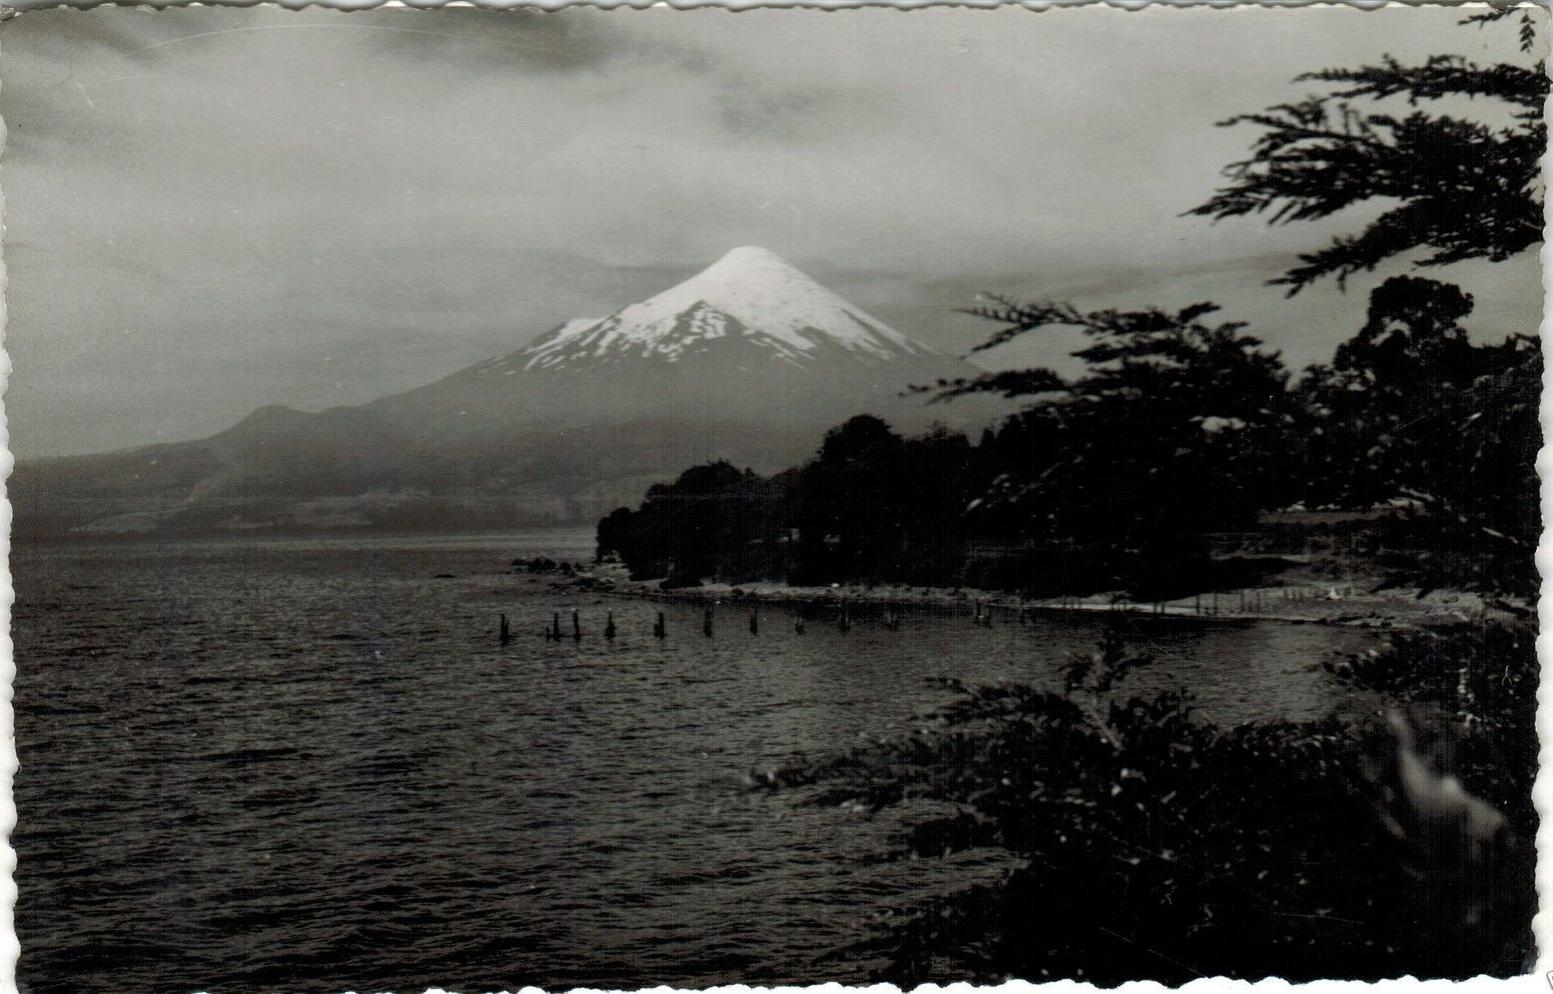 Enterreno - Fotos históricas de chile - fotos antiguas de Chile - Volcán Osorno 1950